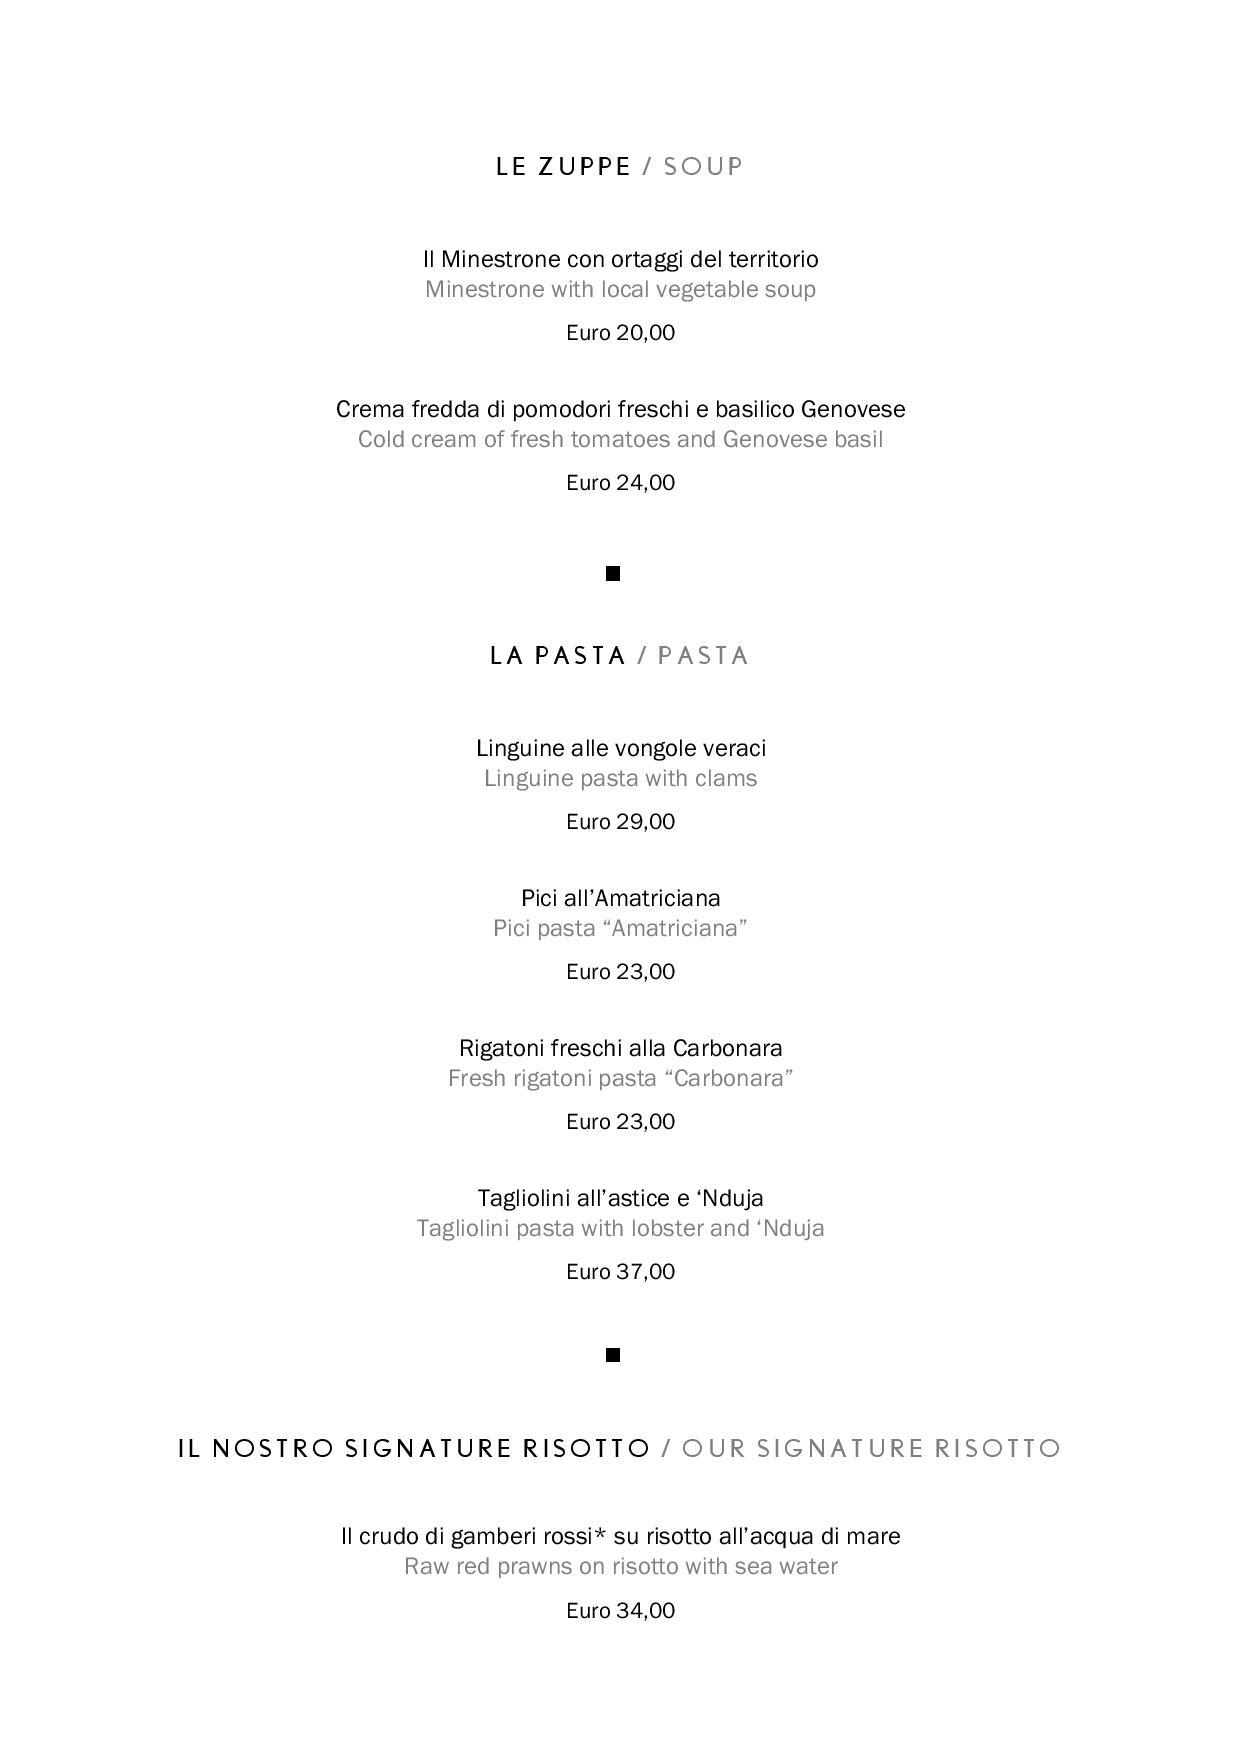 Uliveto food page 003 1 - REVIEW - Rome Cavalieri a Waldorf Astoria Hotel : Premium Rome View Room [COVID-era]